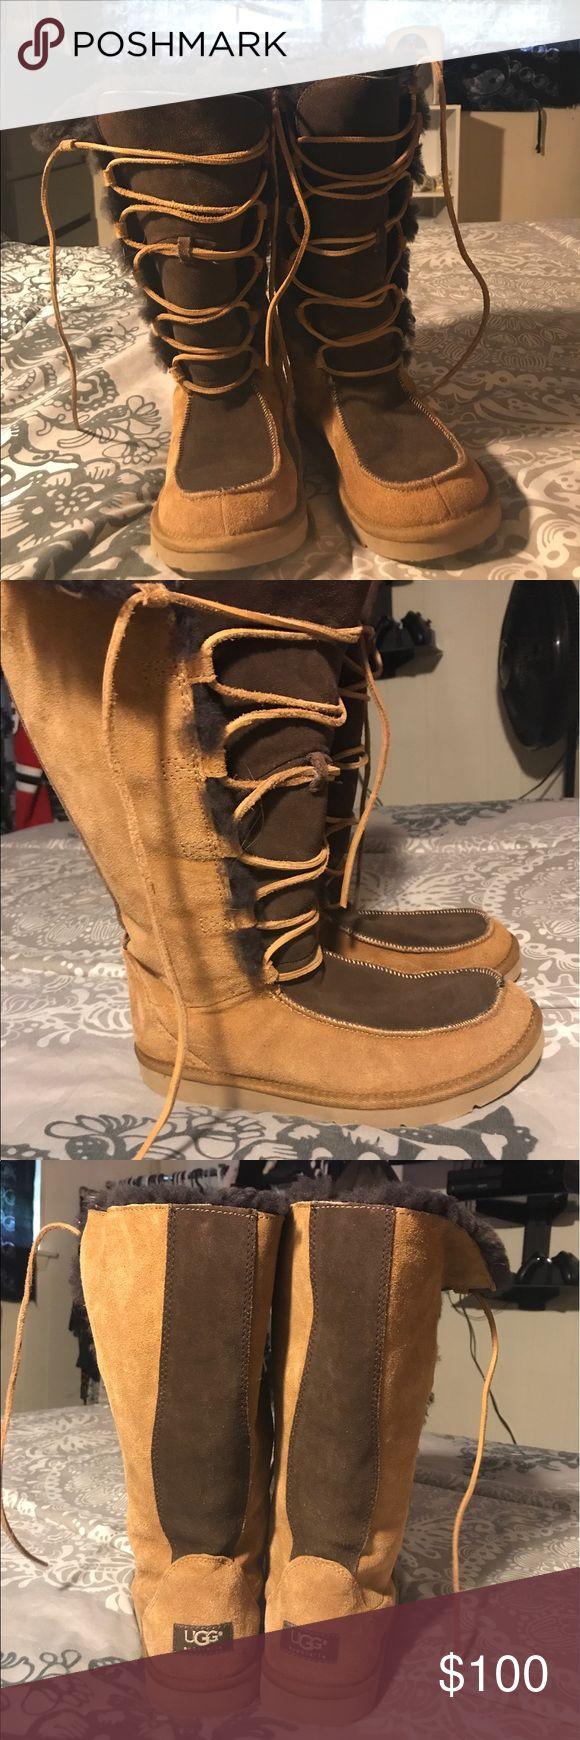 Selling this Lace up Uggs on Poshmark! My username is: mandaaaapandaaa. #shopmycloset #poshmark #fashion #shopping #style #forsale #UGG #Shoes